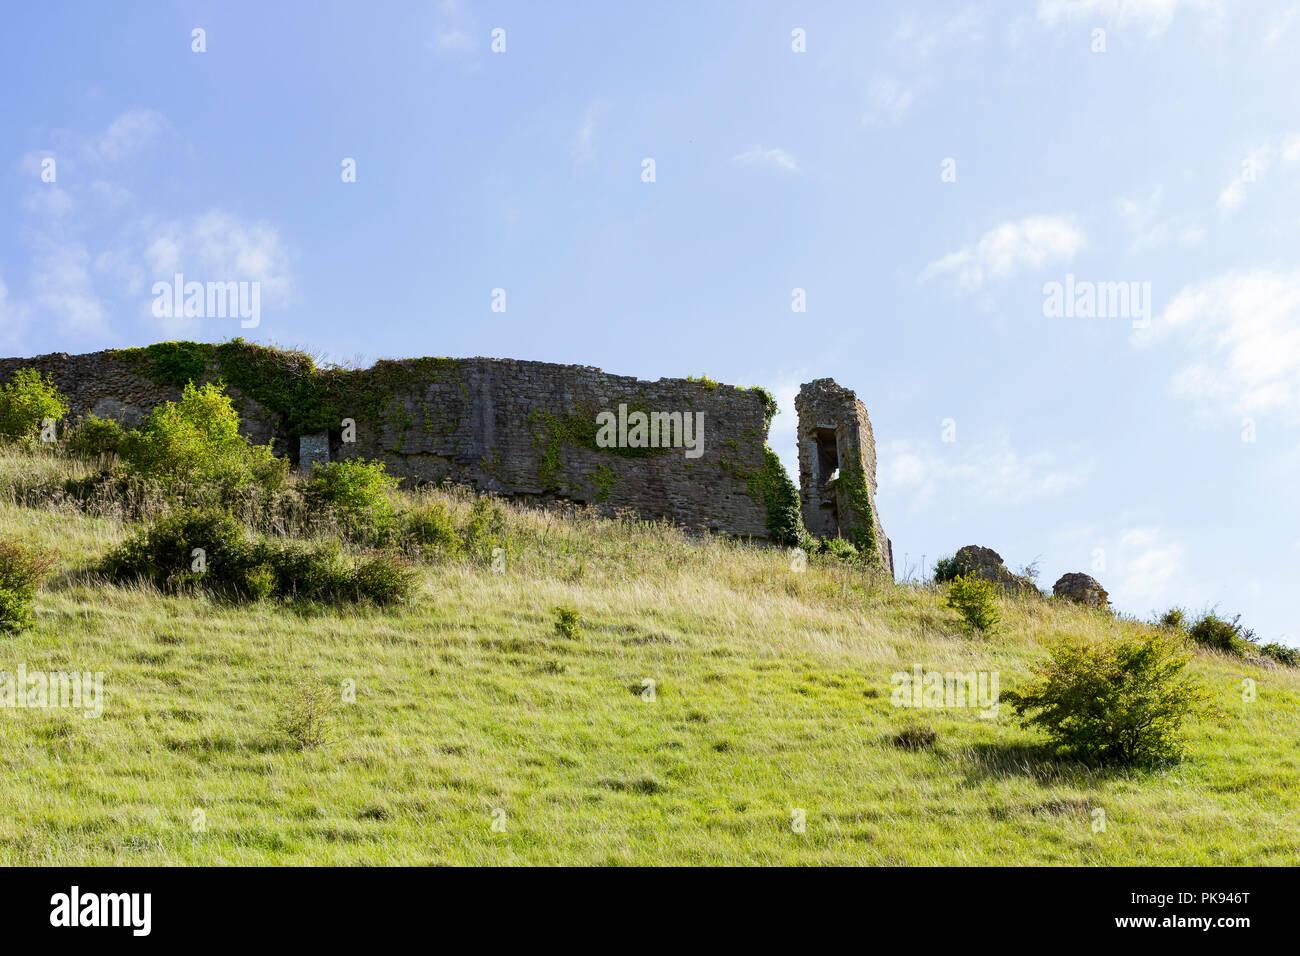 Corfe Castle ruins, Dorset, UK - Stock Image